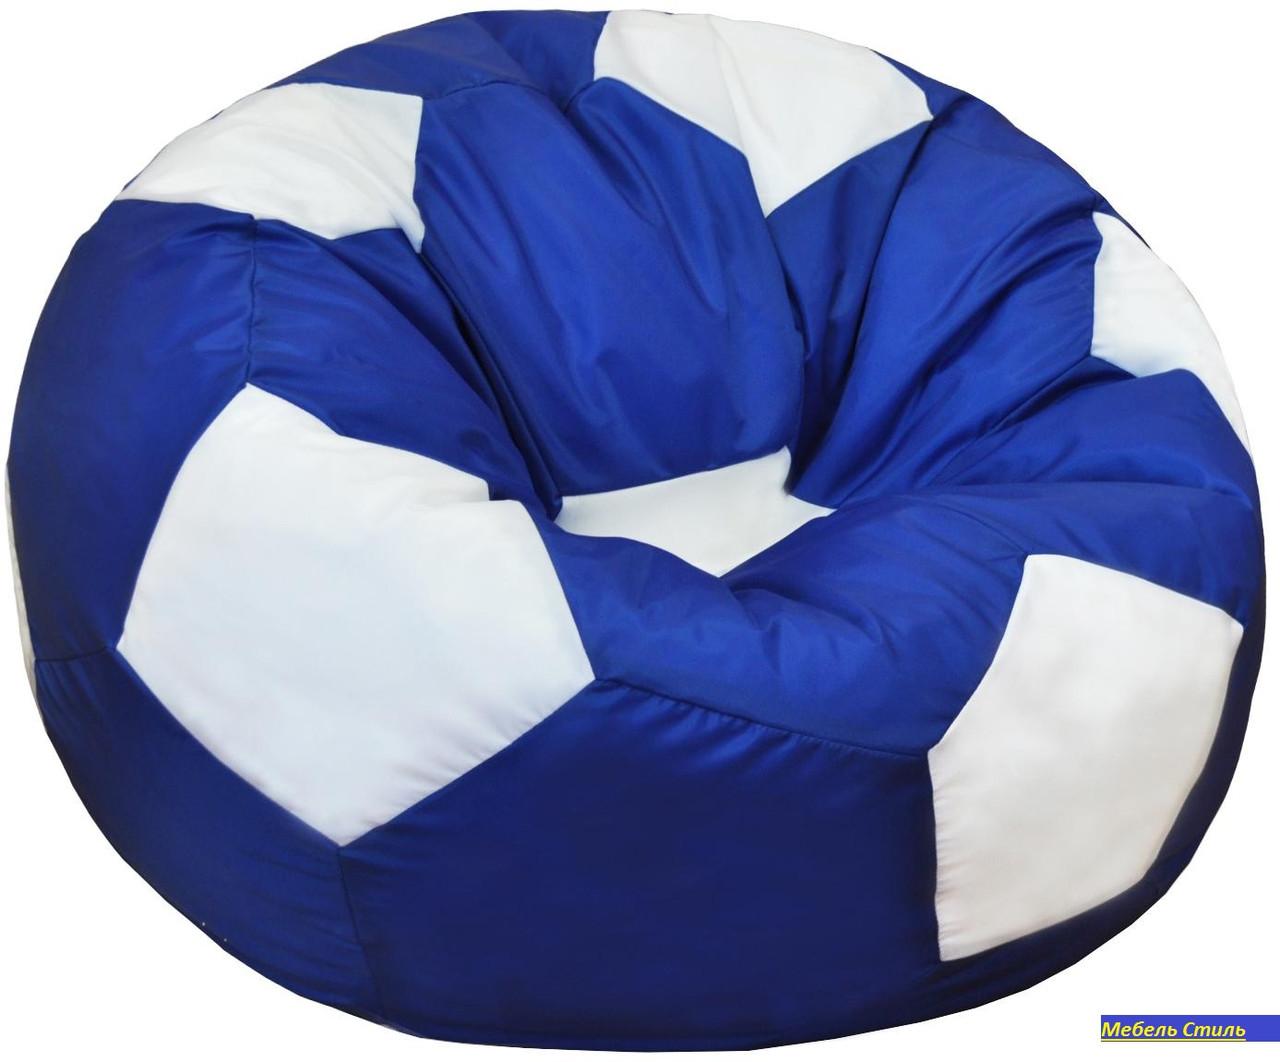 Пуф-мешок Мяч БМО6 сине-белый 110х110 см